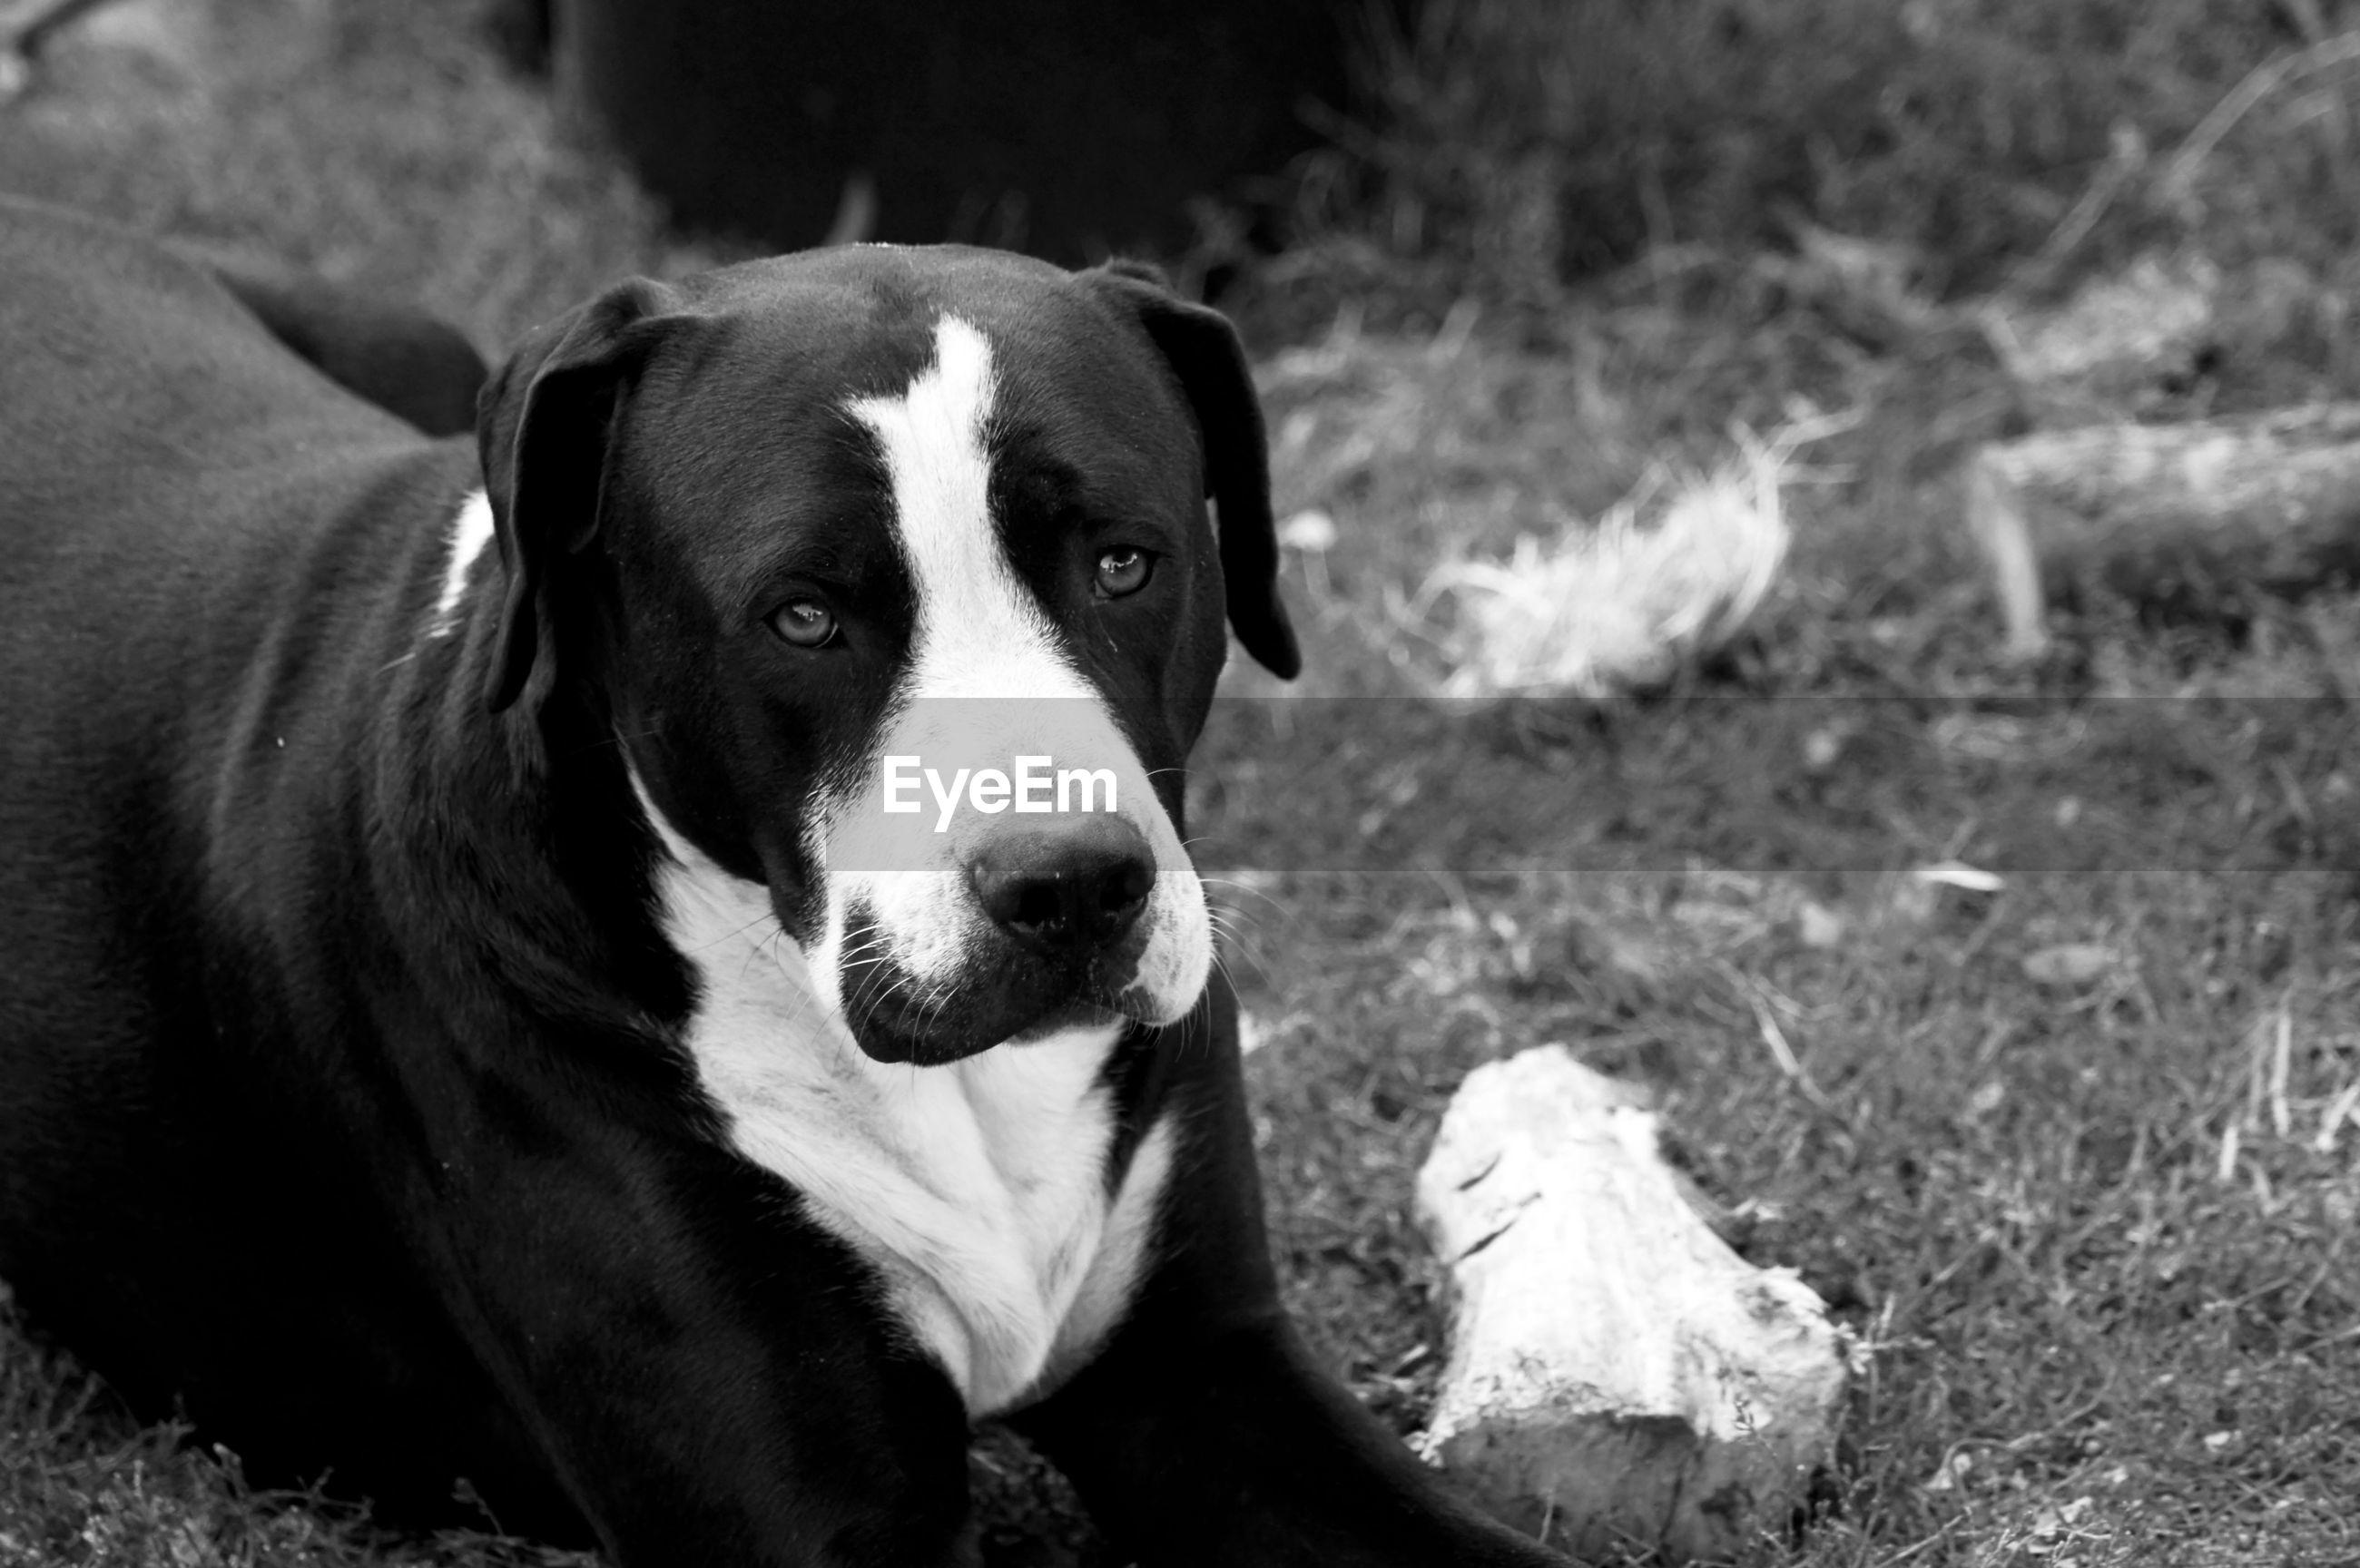 HIGH ANGLE VIEW OF DOG SITTING